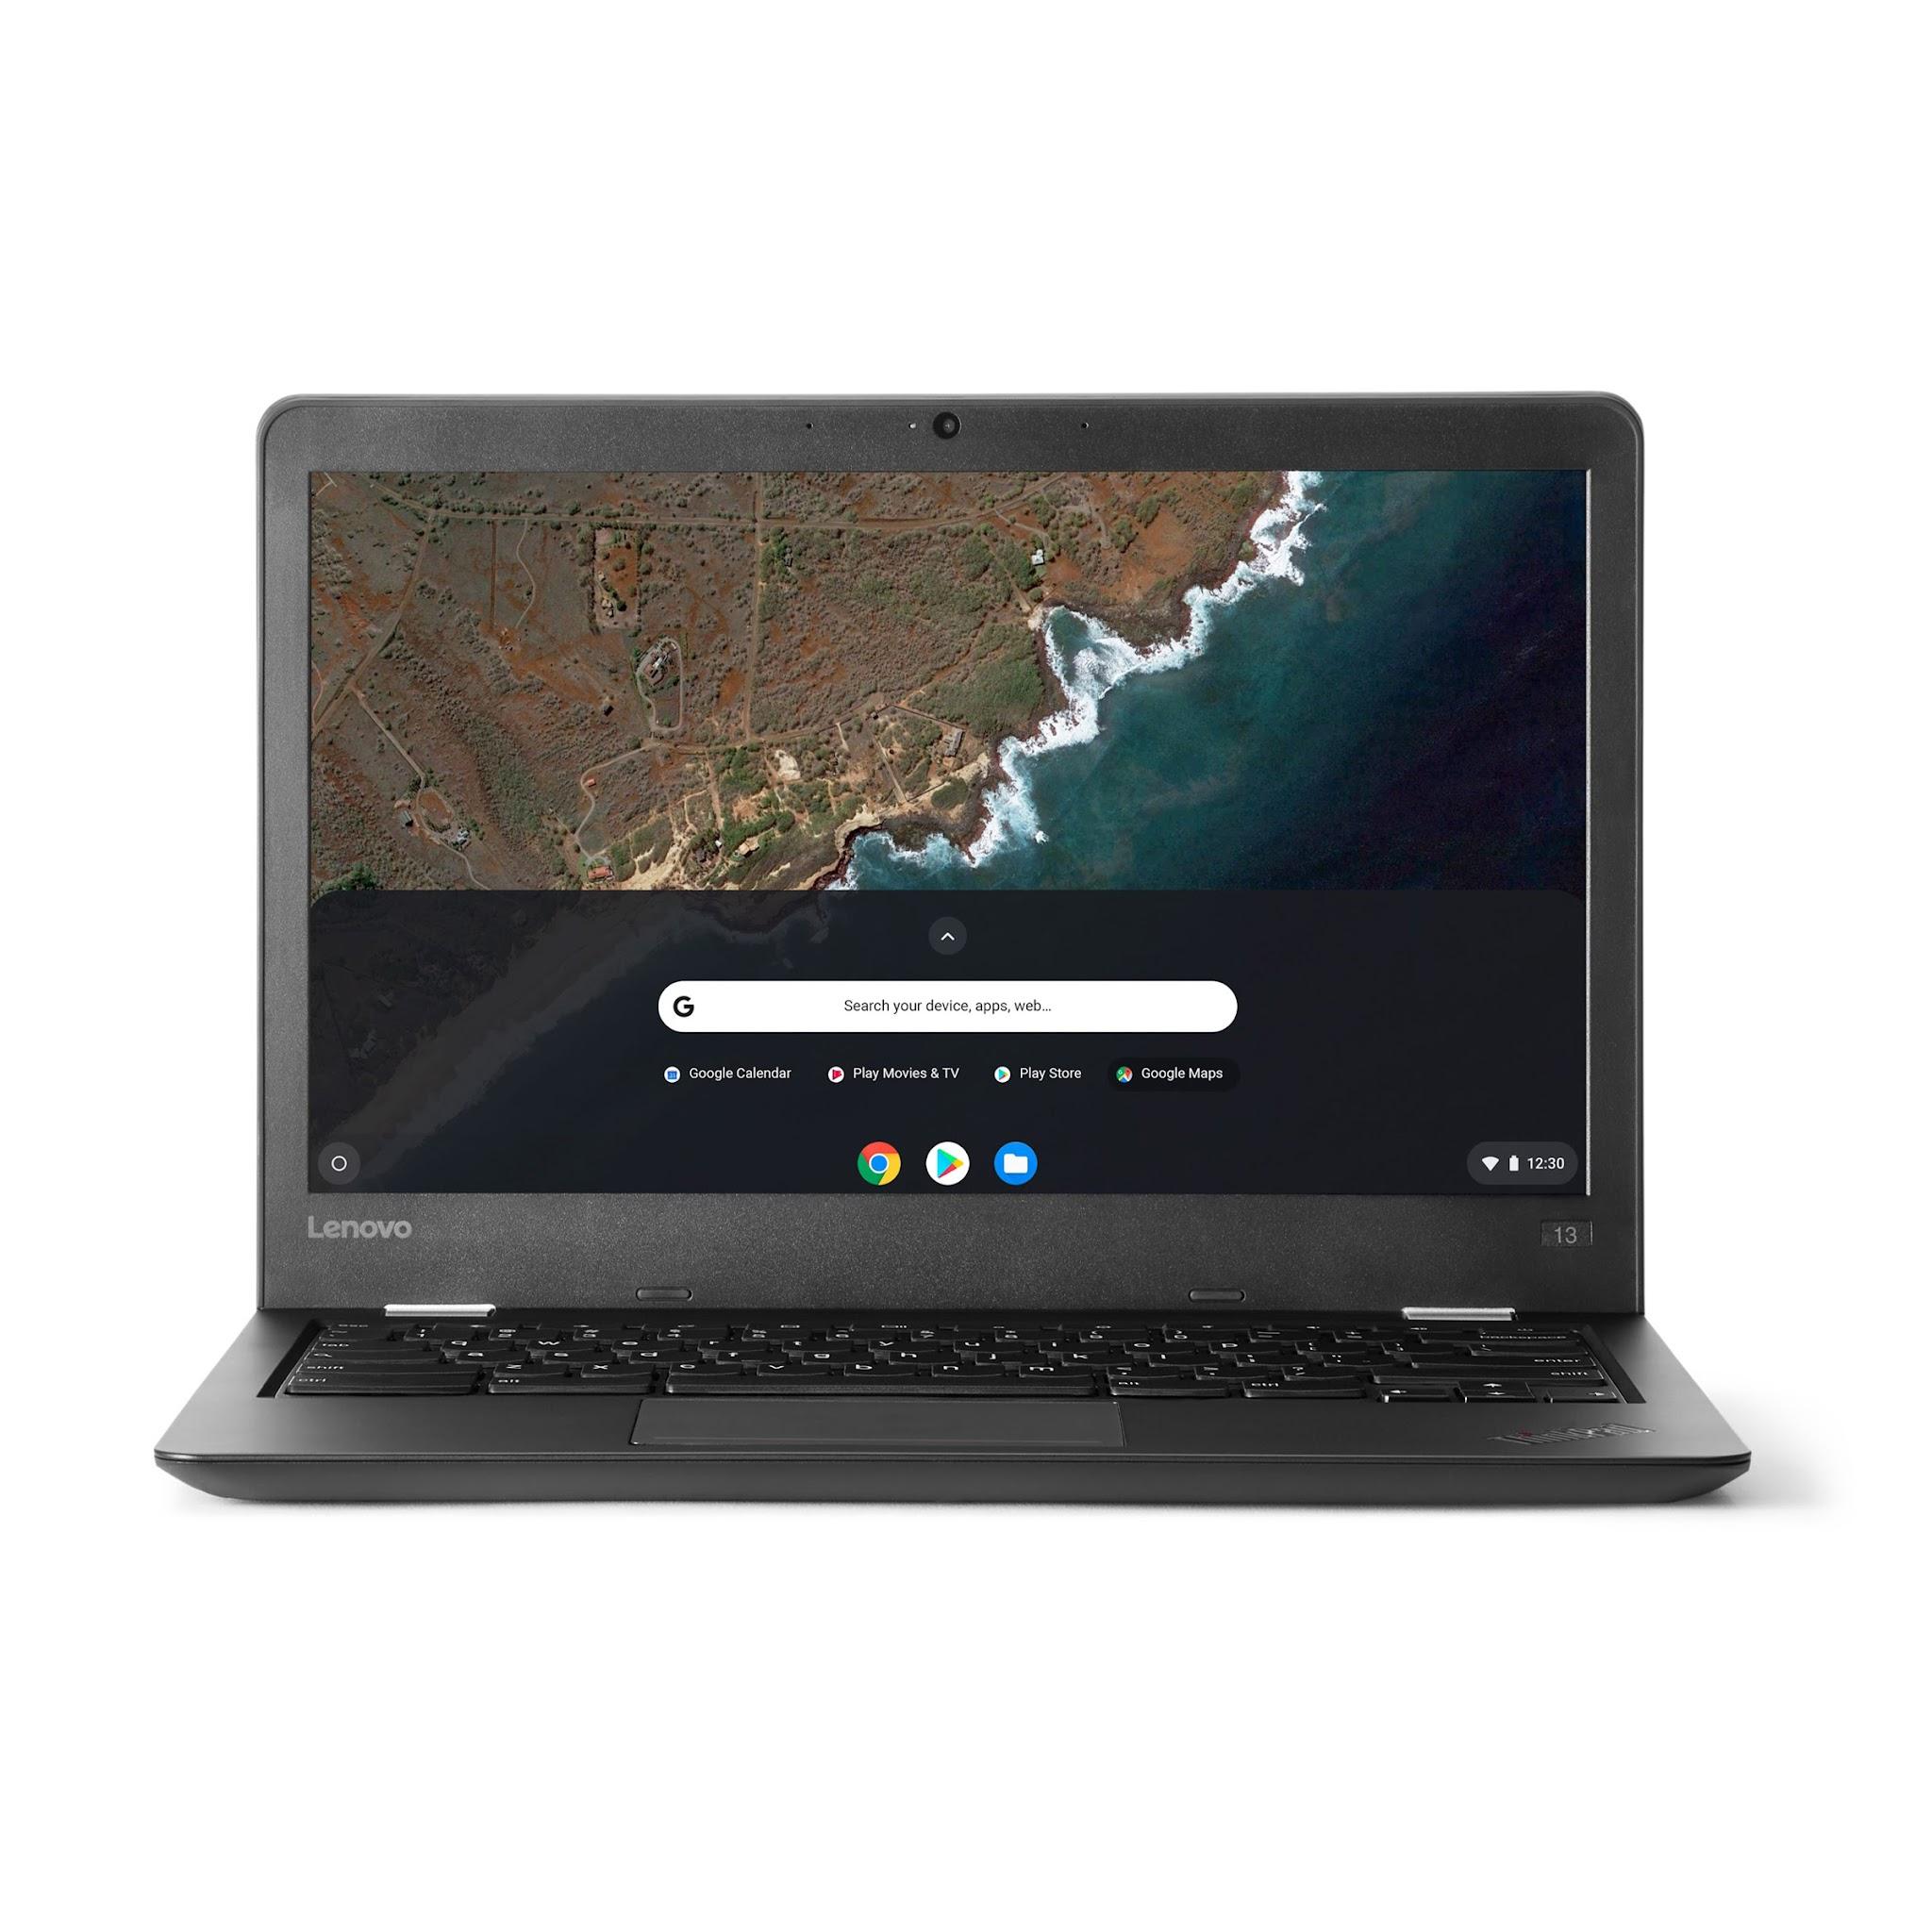 Lenovo Thinkpad 13 Chromebook - photo 1